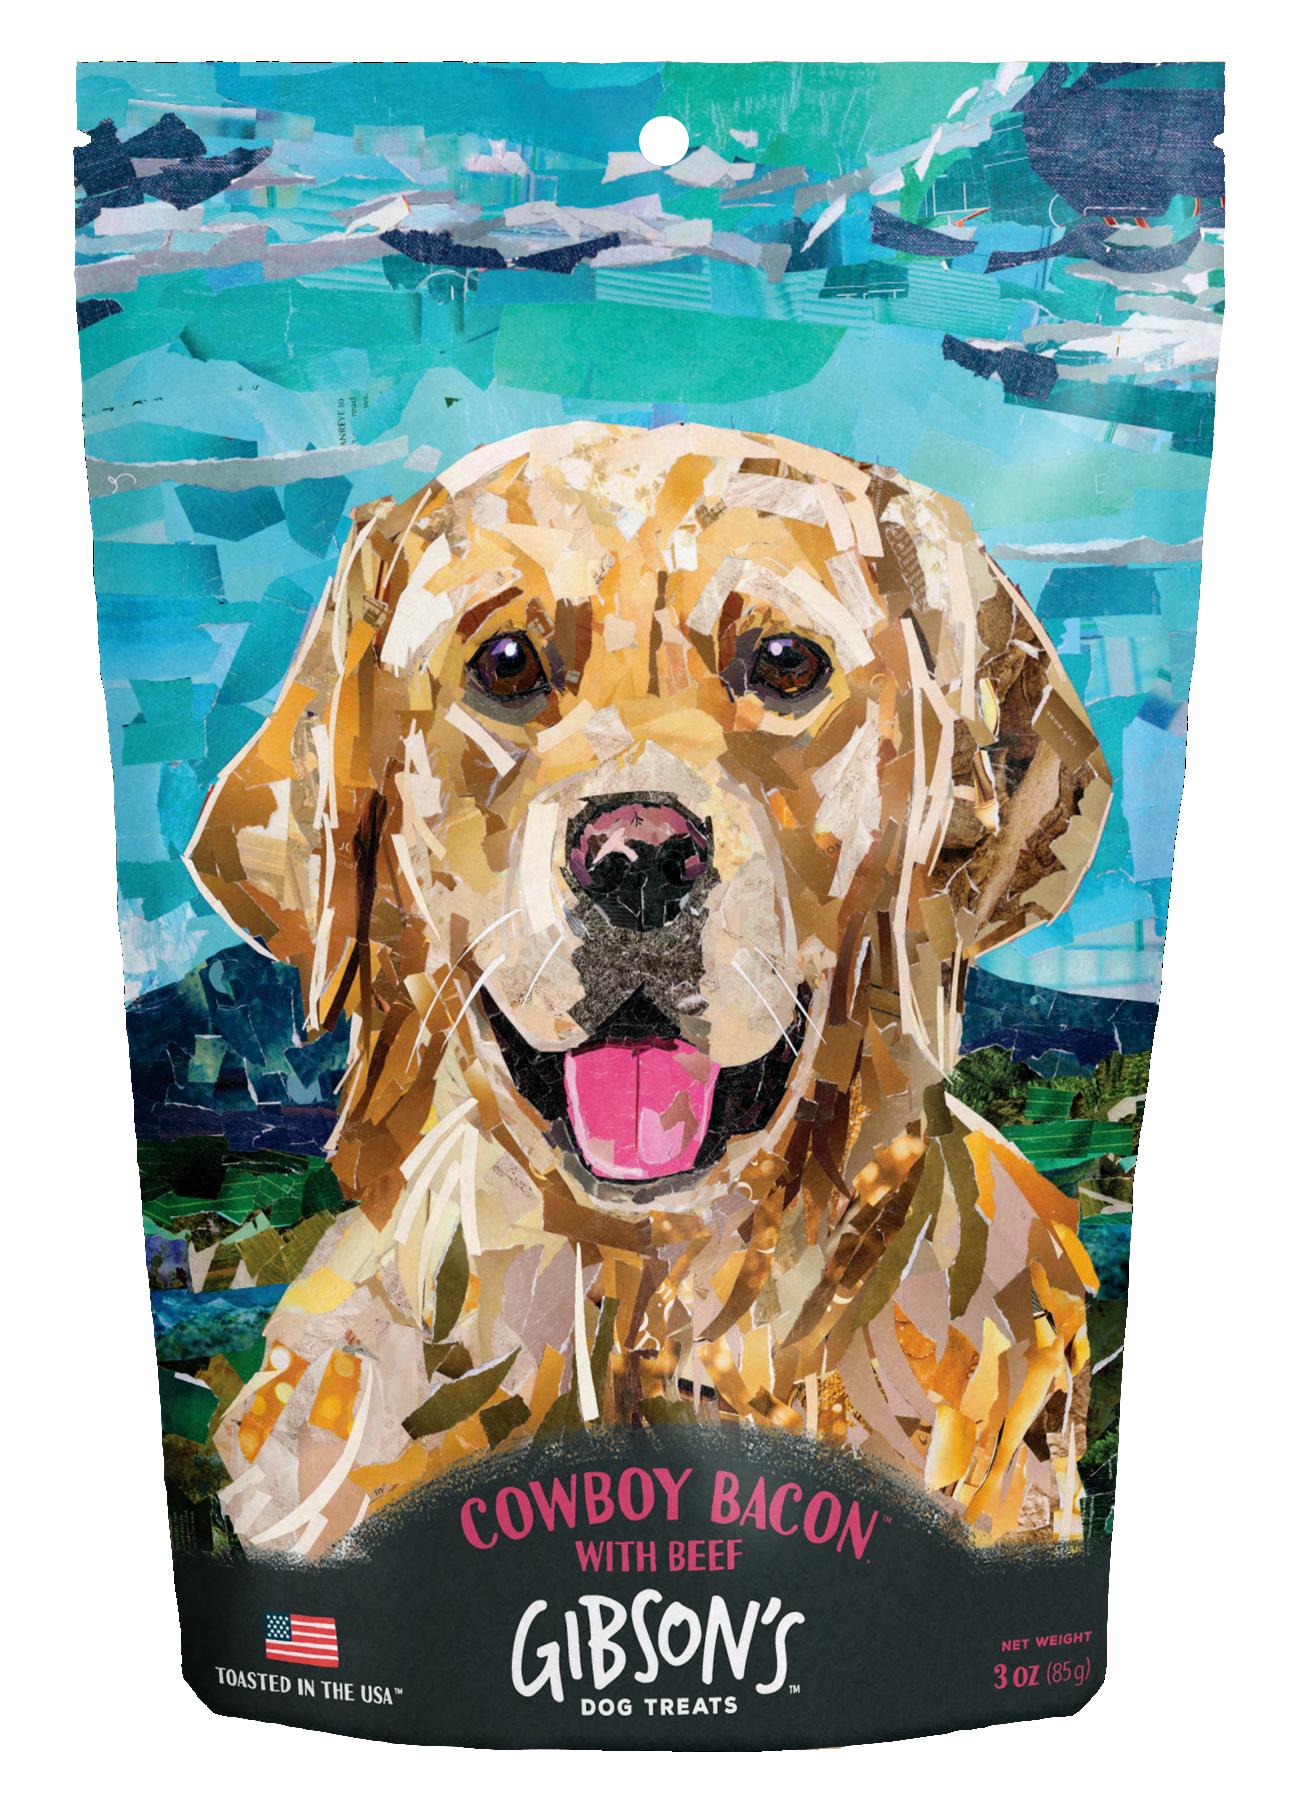 Wild Meadow Farms Gibson's Cowboy Bacon with Beef Dog Treats, 3-oz